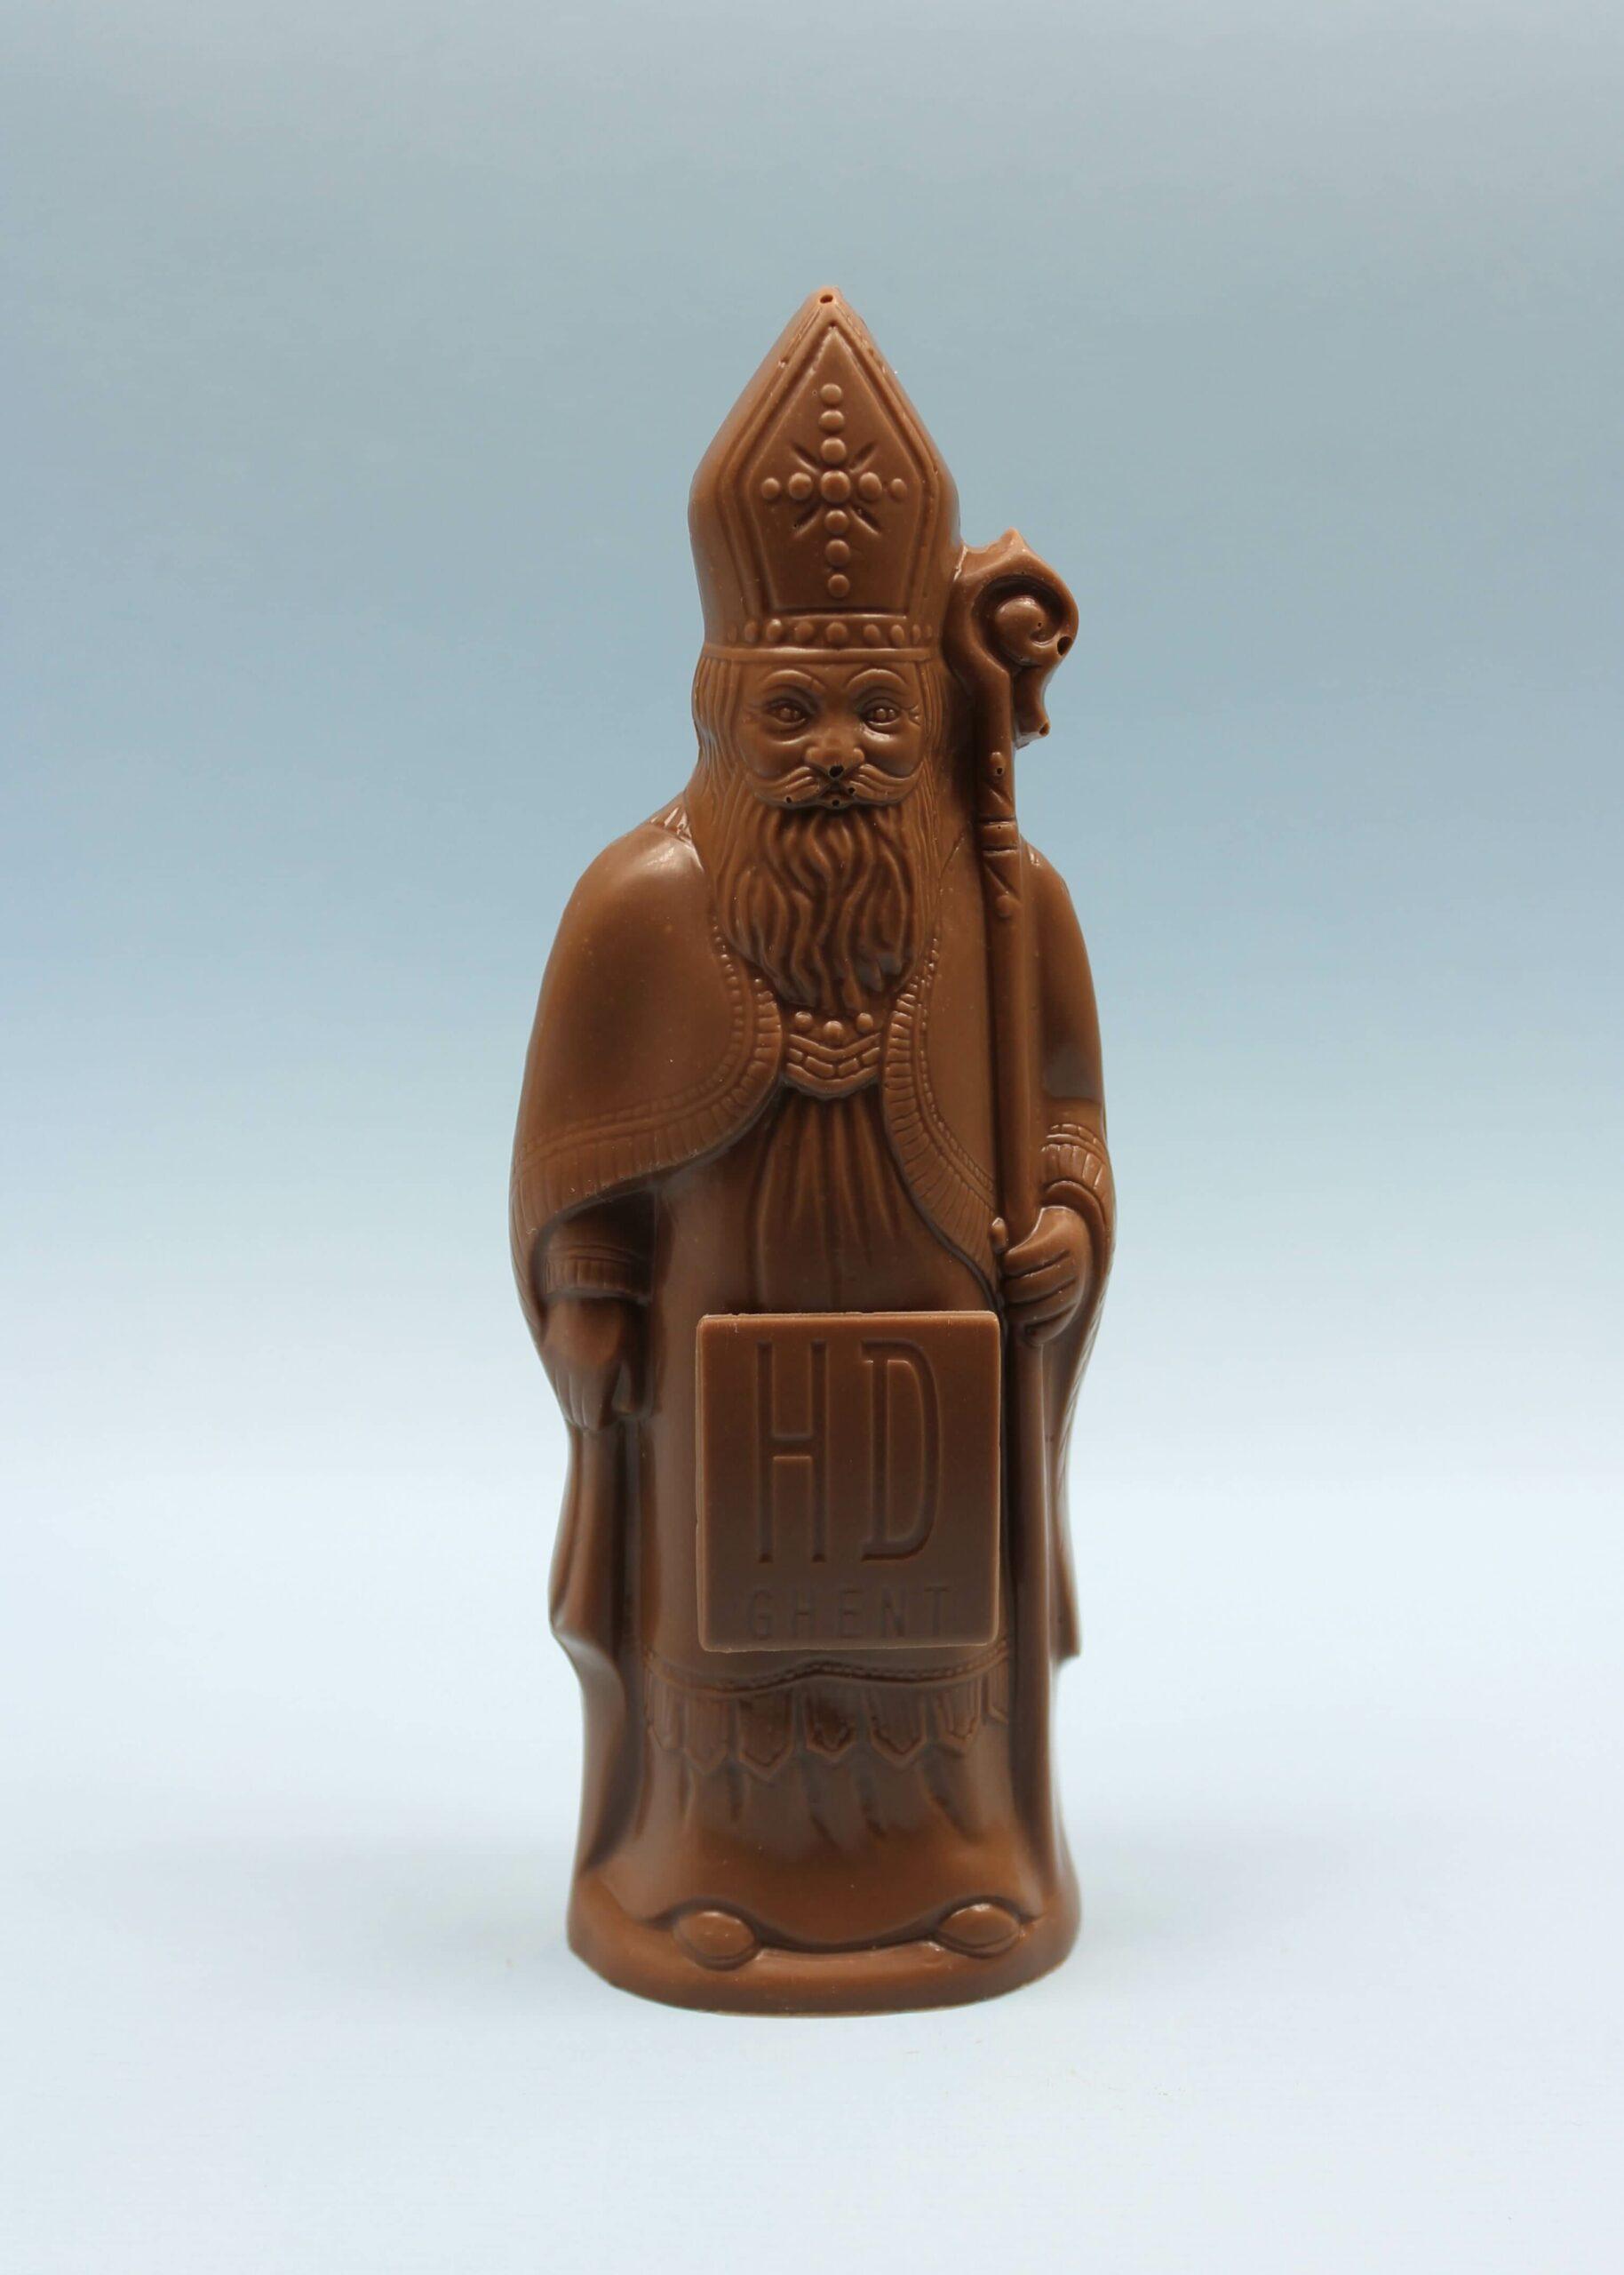 hd ghent by hilde devolder chocolatier sinterklaas melkchocolade 17 cm